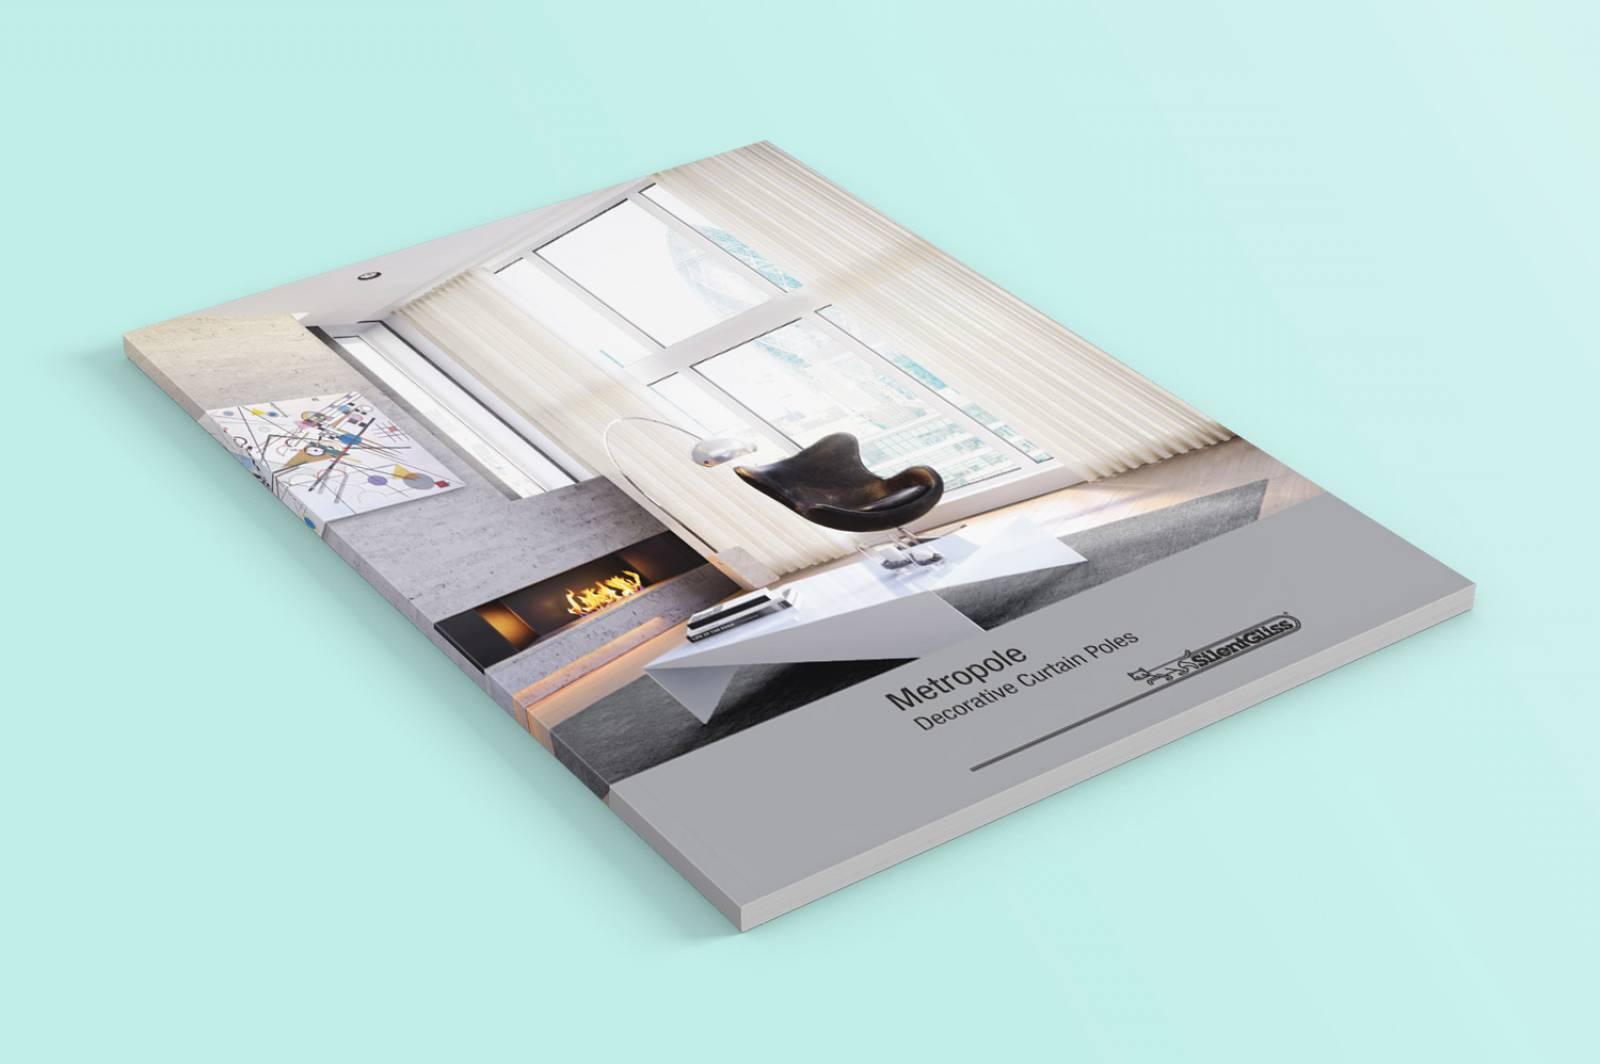 Silent-gliss-brochure-1-design-agency-graphic-design-canterbury.jpg